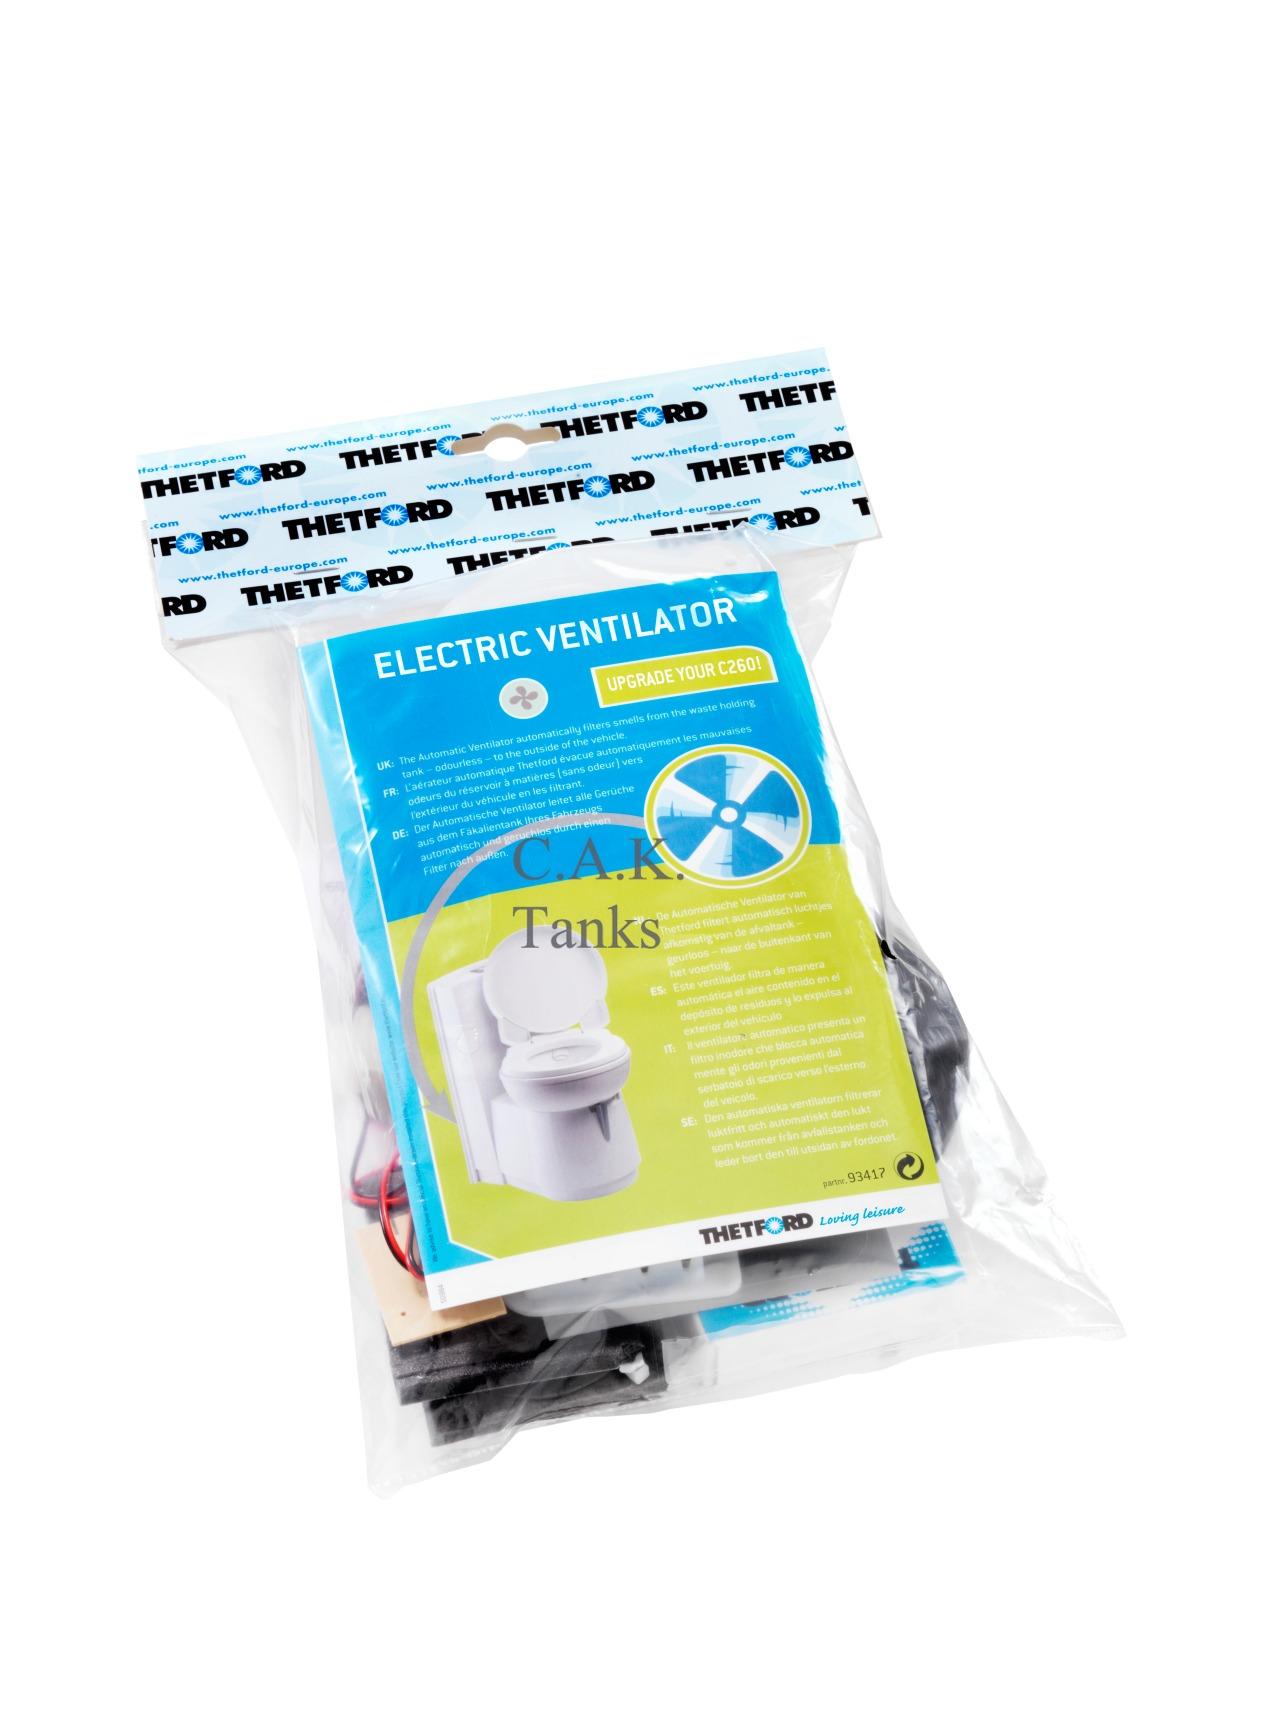 Schema Elettrico Wc Thetford : Option auto fan vent new c thetford cassette toilet